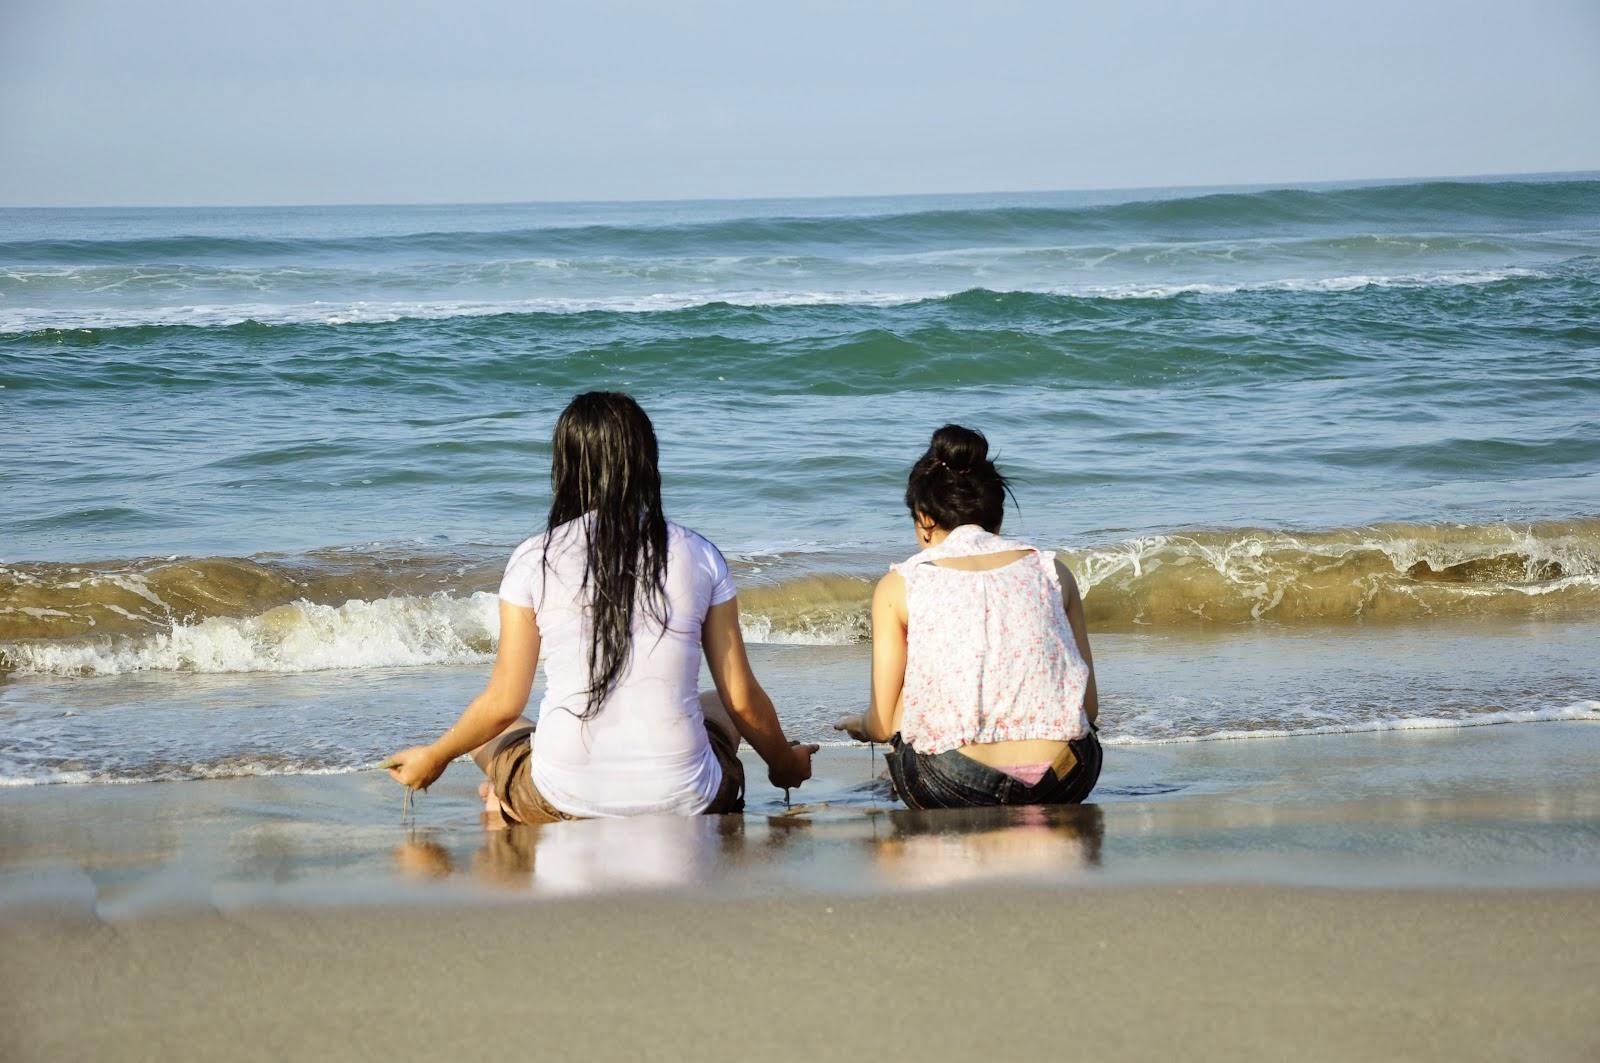 sawarna beach penginapan villa homestay resort dan hotel